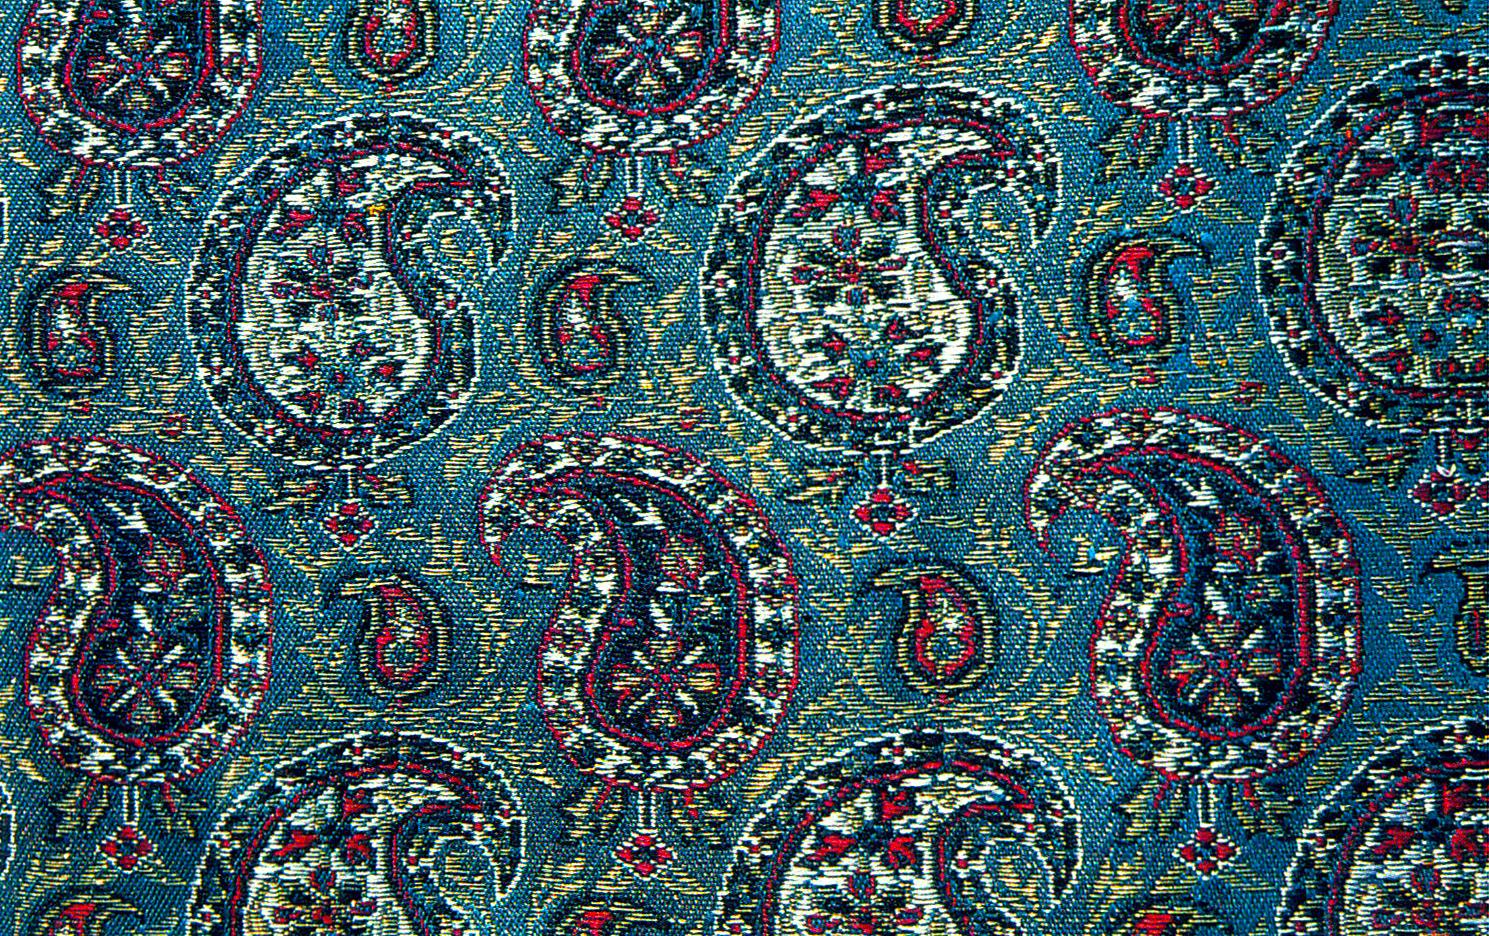 Persian_Silk_Brocade_-_Paisley_-_Persian_Paisley_-_Seyyed_Hossein_Mozhgani_-_1963